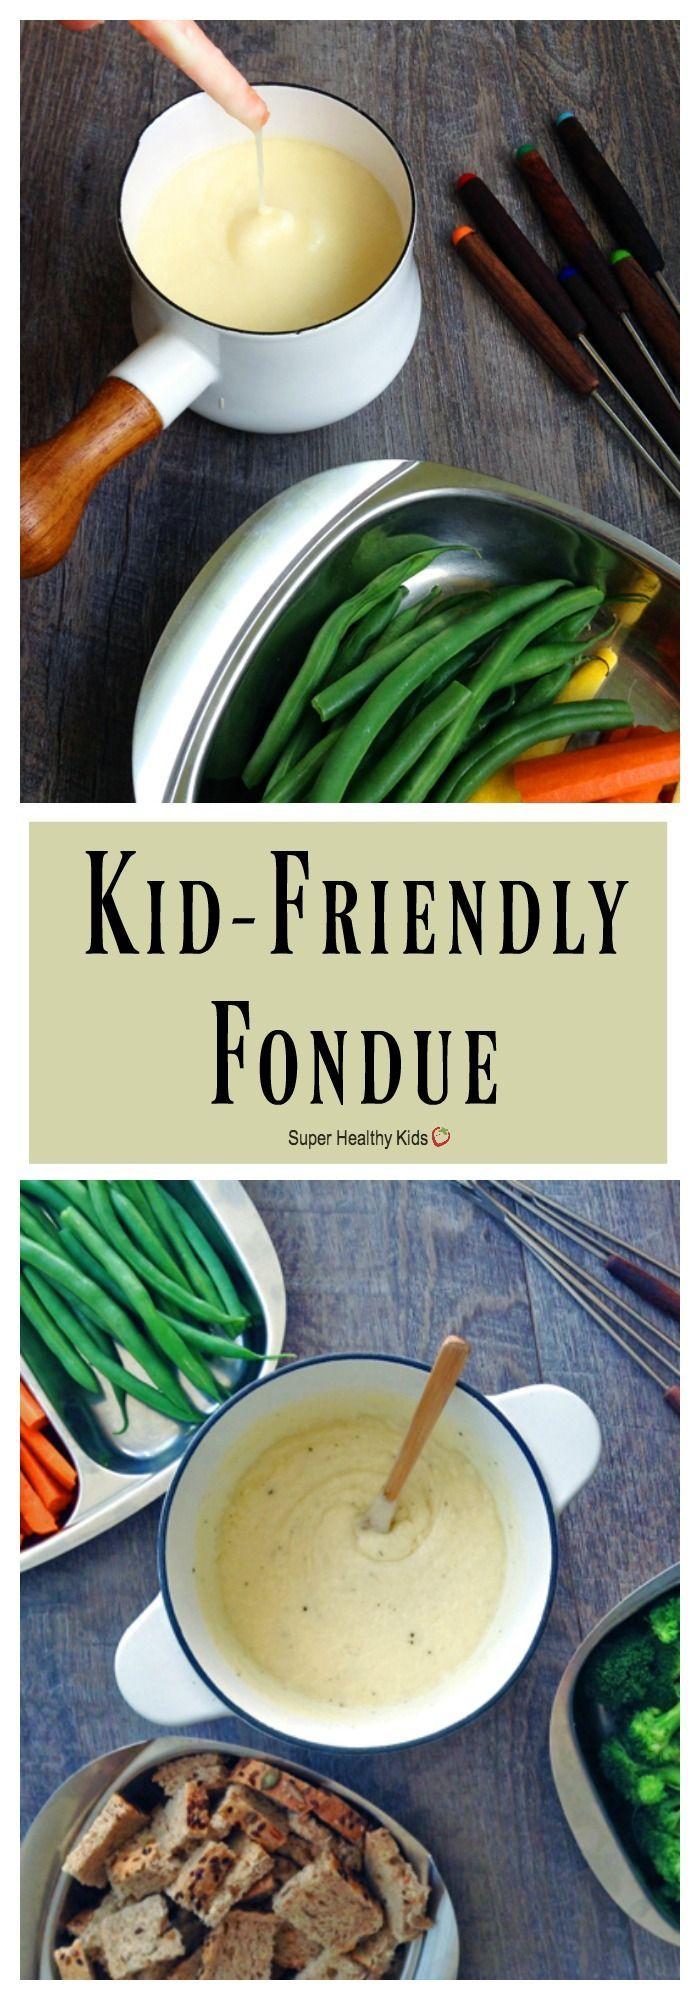 FOOD - Kid-Friendly Fondue. A few simple changes turn classic Swiss fondue into a kid-friendly, fun family dinner! http://www.superhealthykids.com/kid-friendly-fondue/